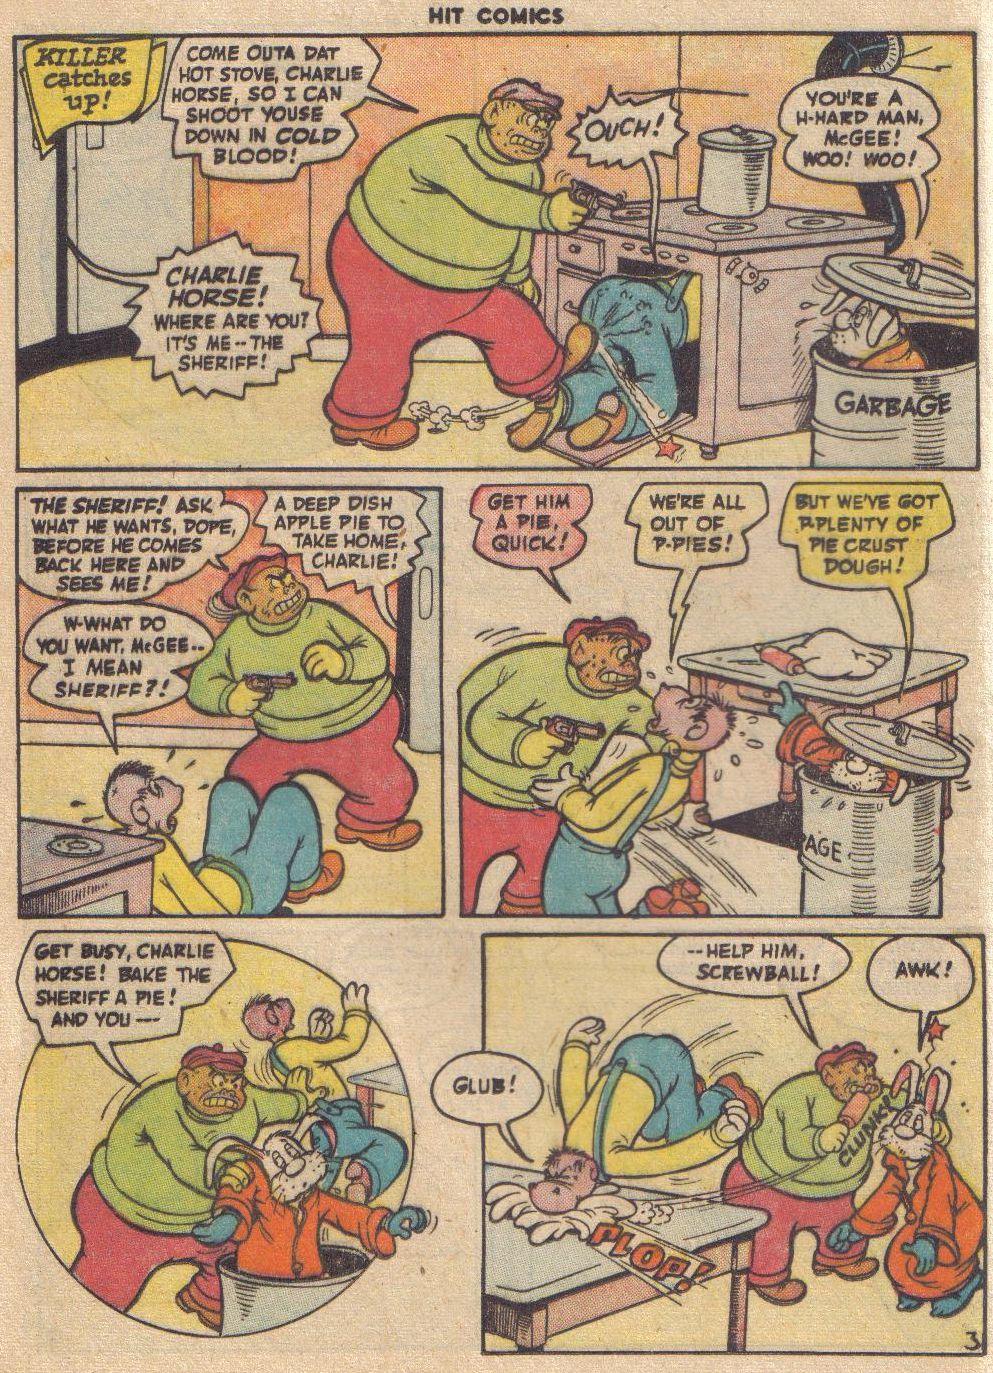 Read online Hit Comics comic -  Issue #45 - 49